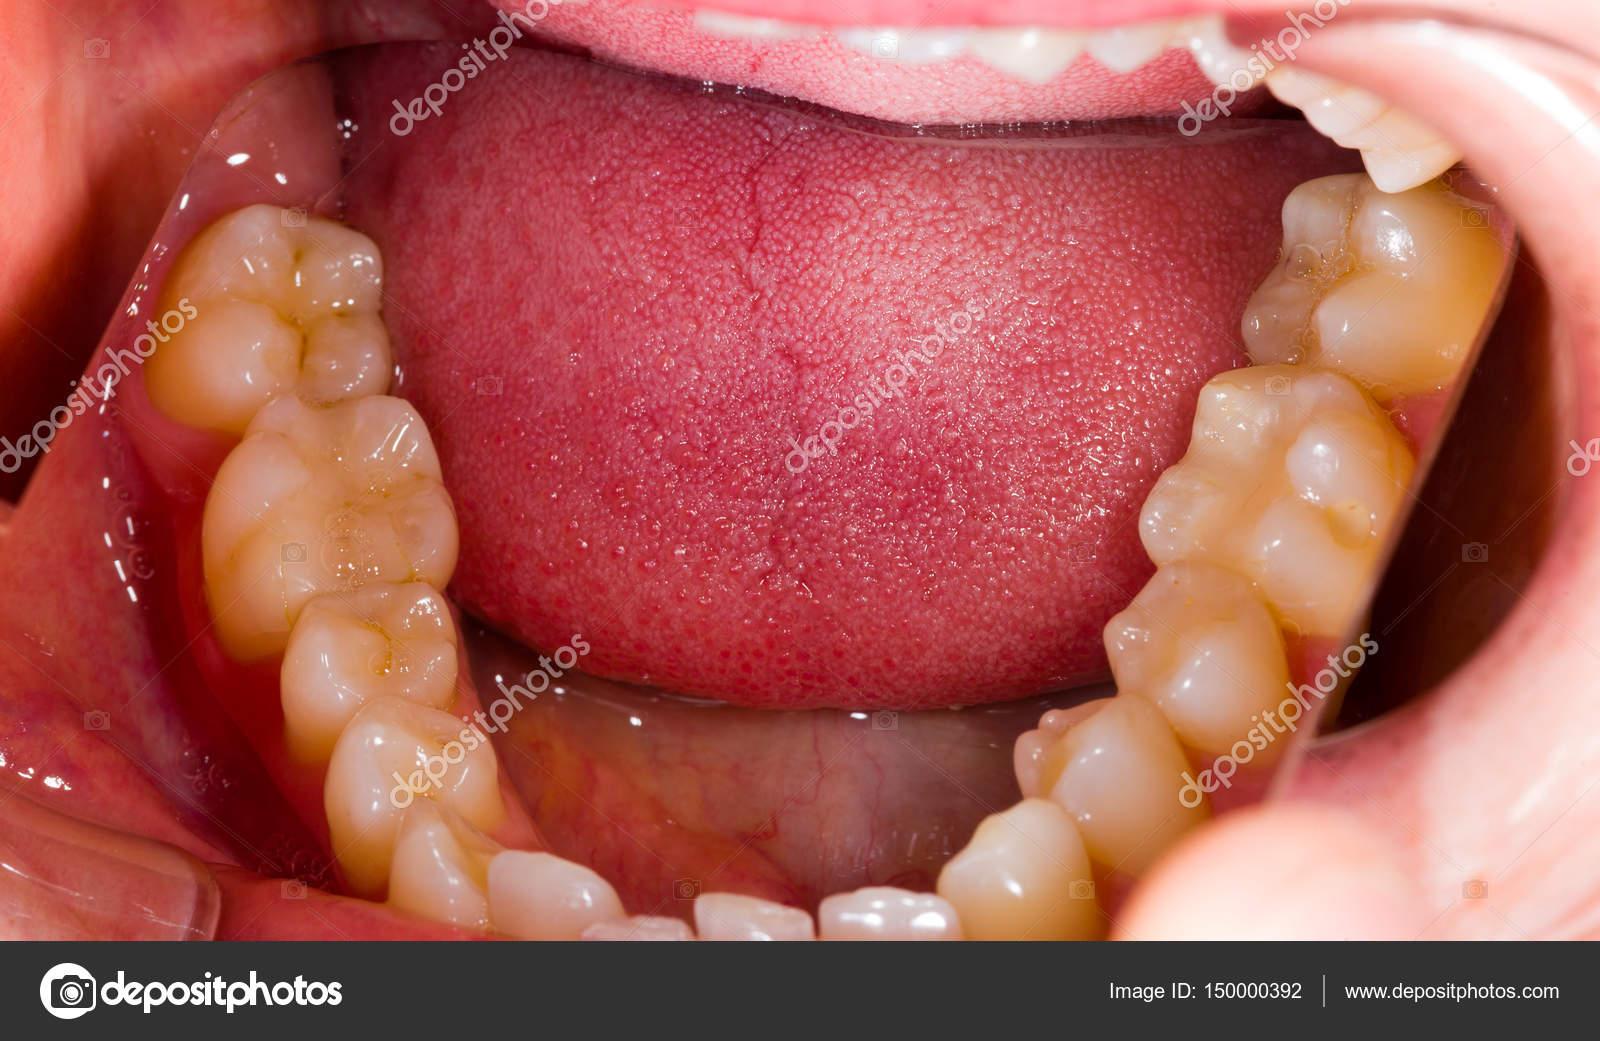 Zahnärztliche Anatomie — Stockfoto © Lighthunter #150000392